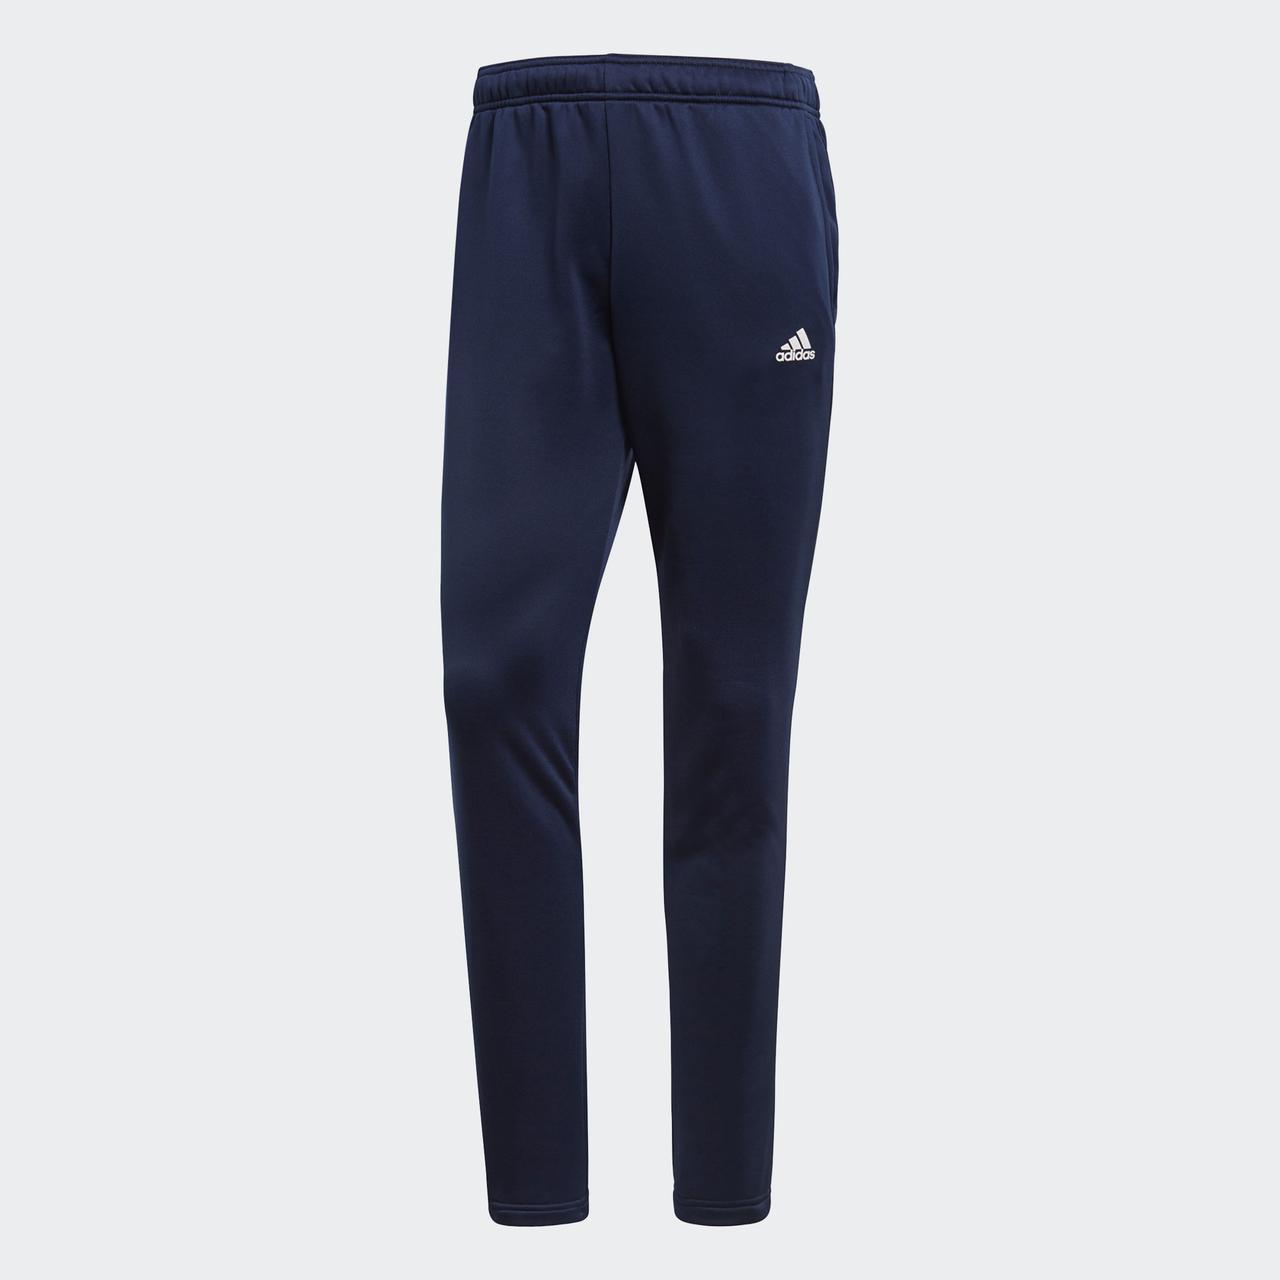 5c2ab21d ... Мужской спортивный костюм Adidas Performance Re-Focus (Артикул:  CF1618), ...